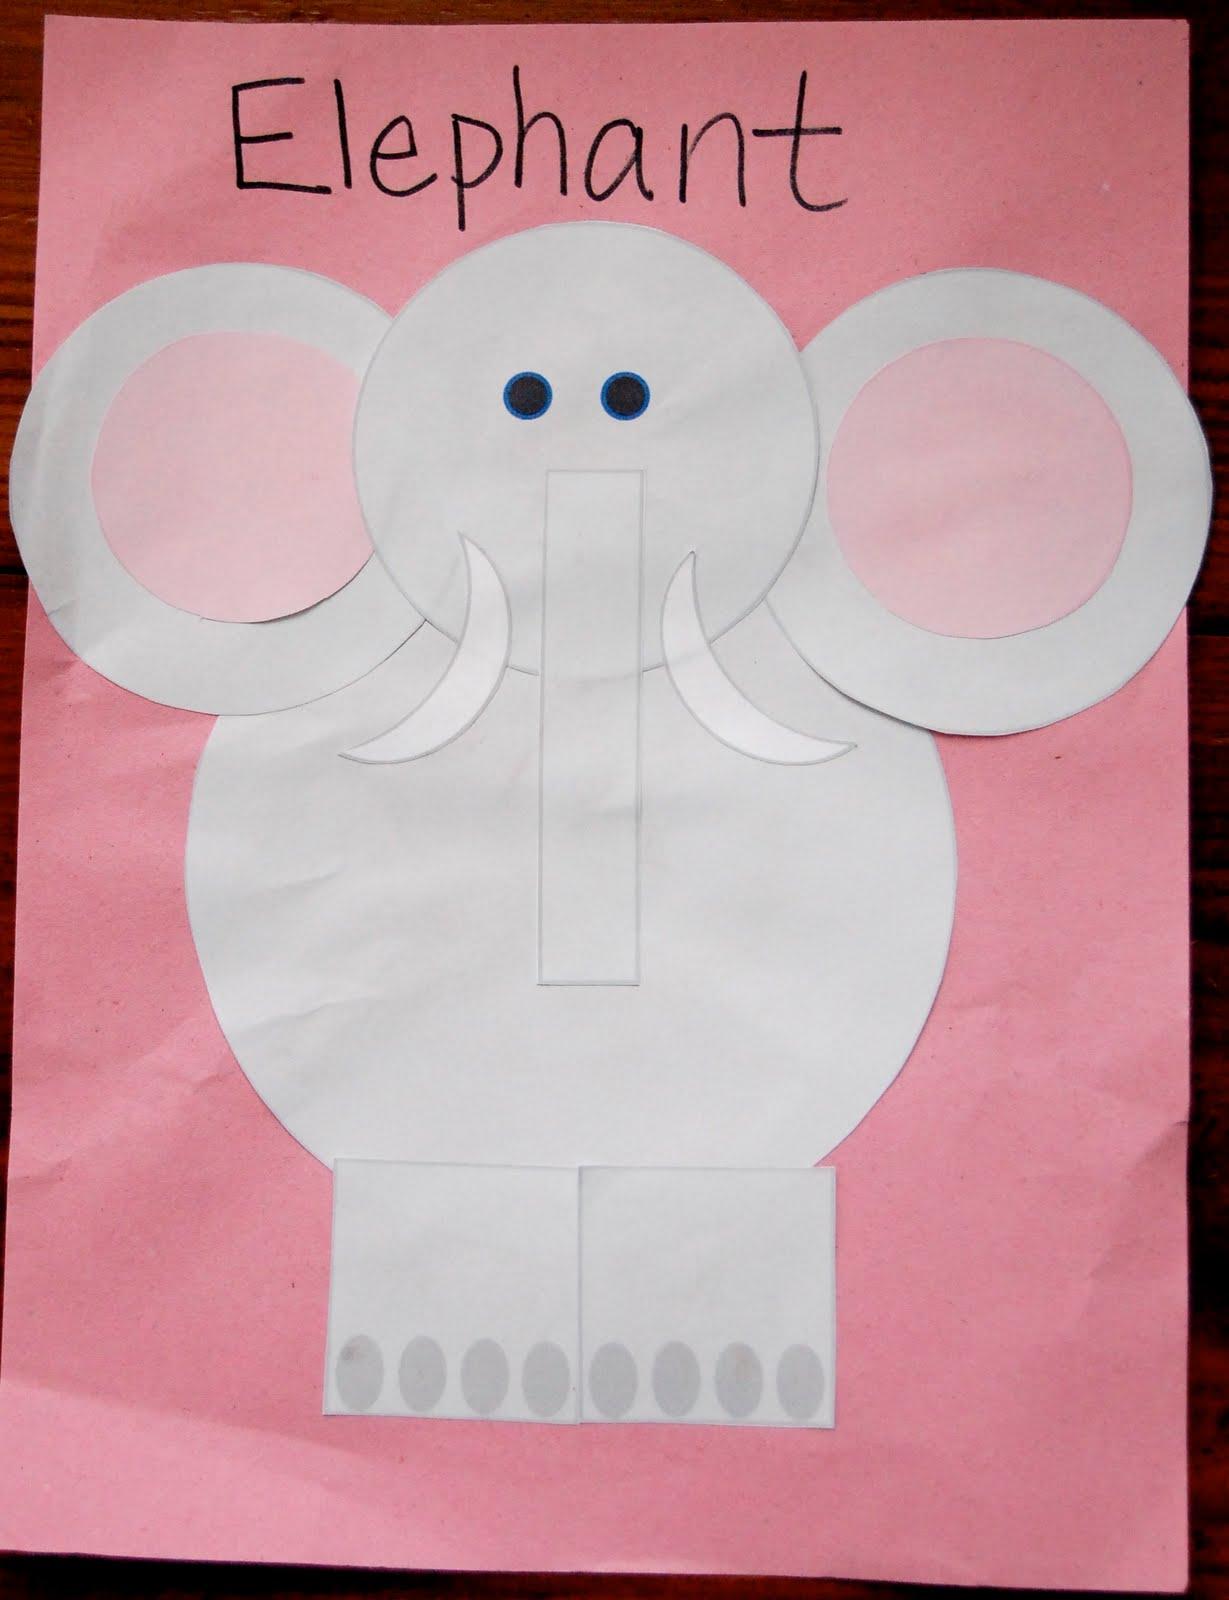 elephant crafts for preschool learning 4 november 2009 780